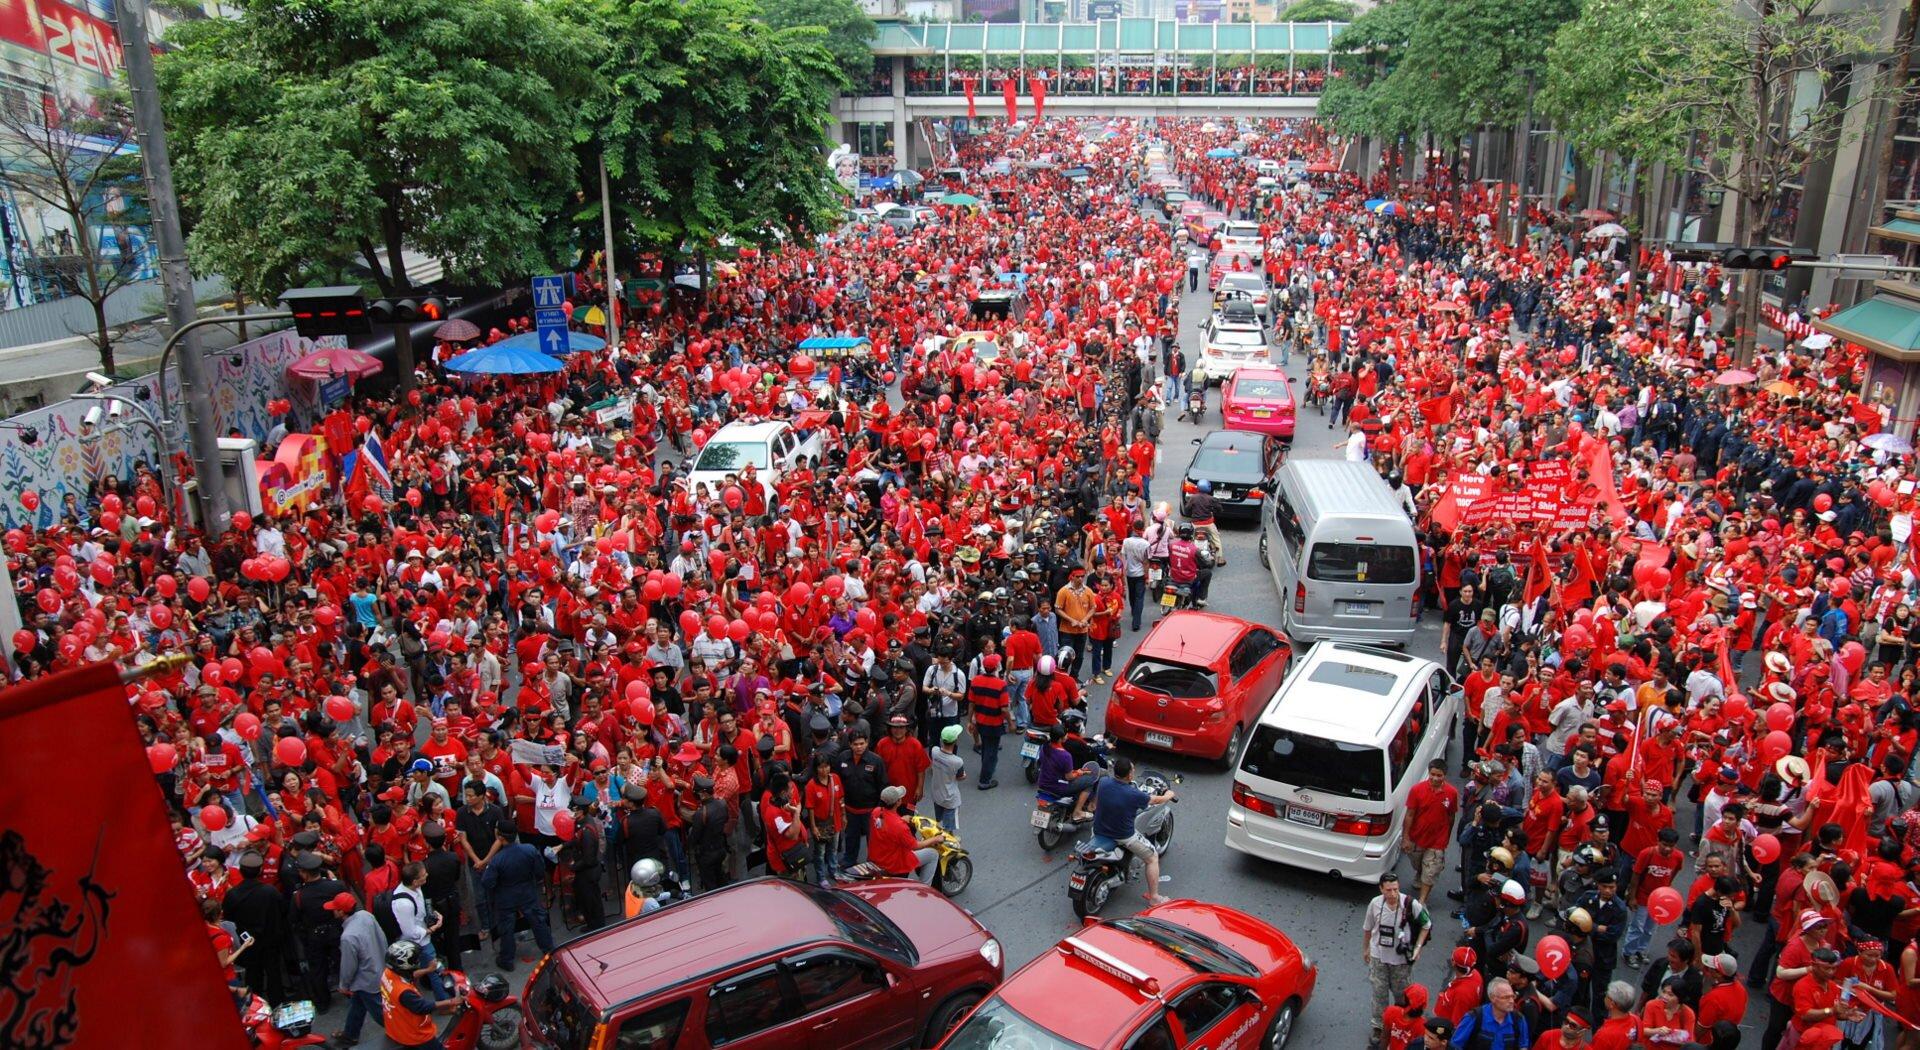 """Red Shirt"" protest wRatchaprasong Chcą podwyżki płac Źródło: Takeaway, ""Red Shirt"" protest wRatchaprasong , 2010, fotografia, licencja: CC BY-SA 3.0."